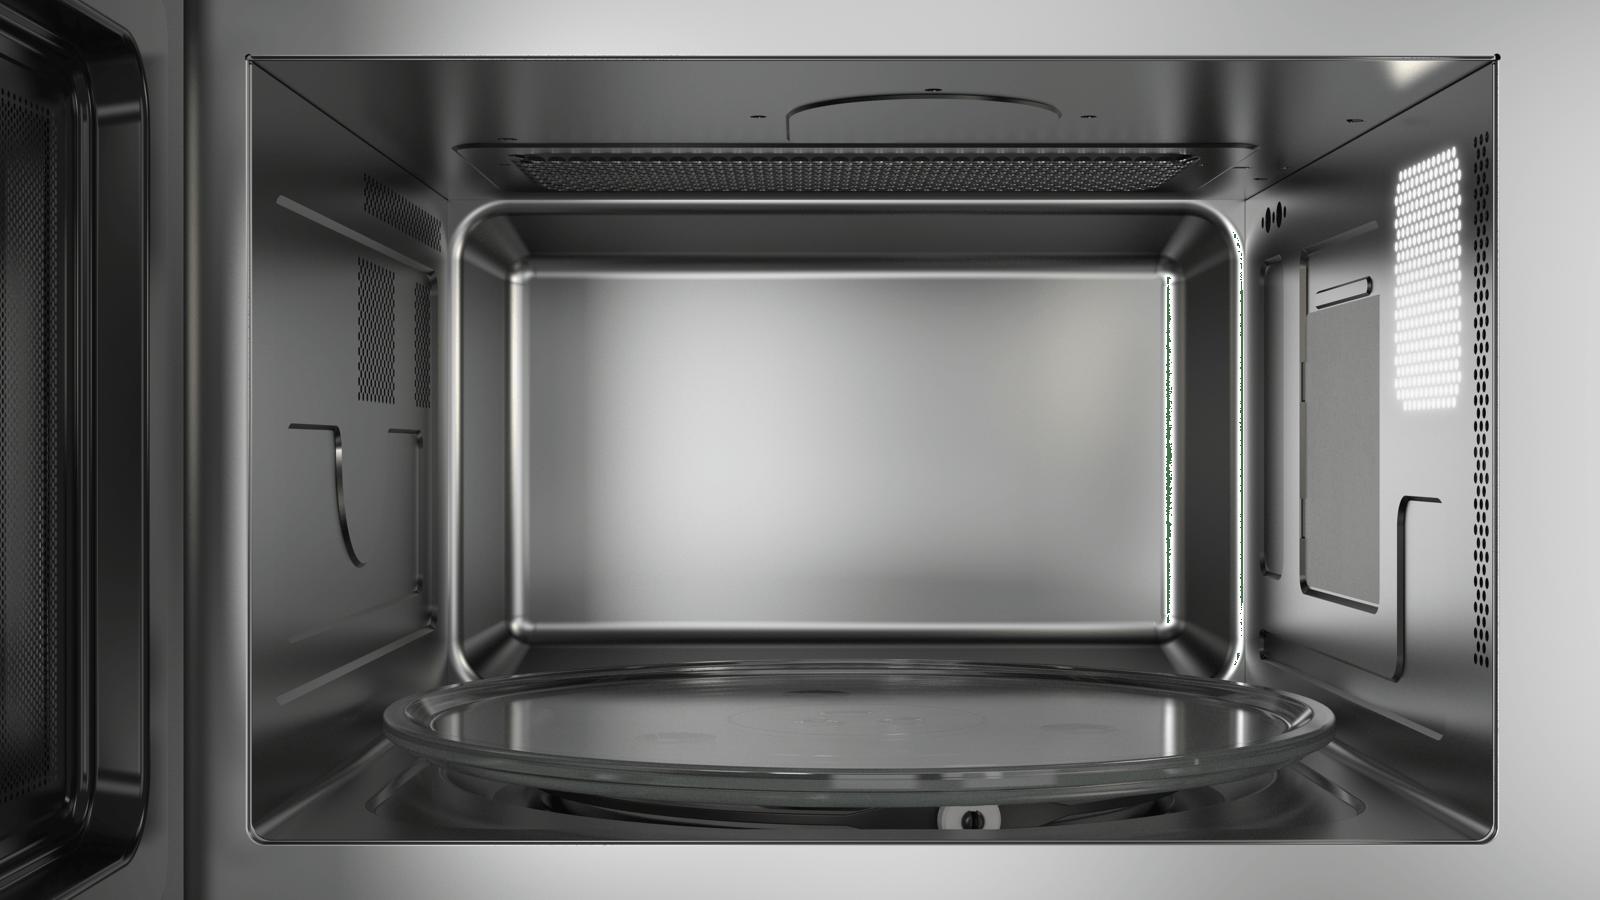 Mikrodalğalı soba Bosch FEM553MB0  - 2